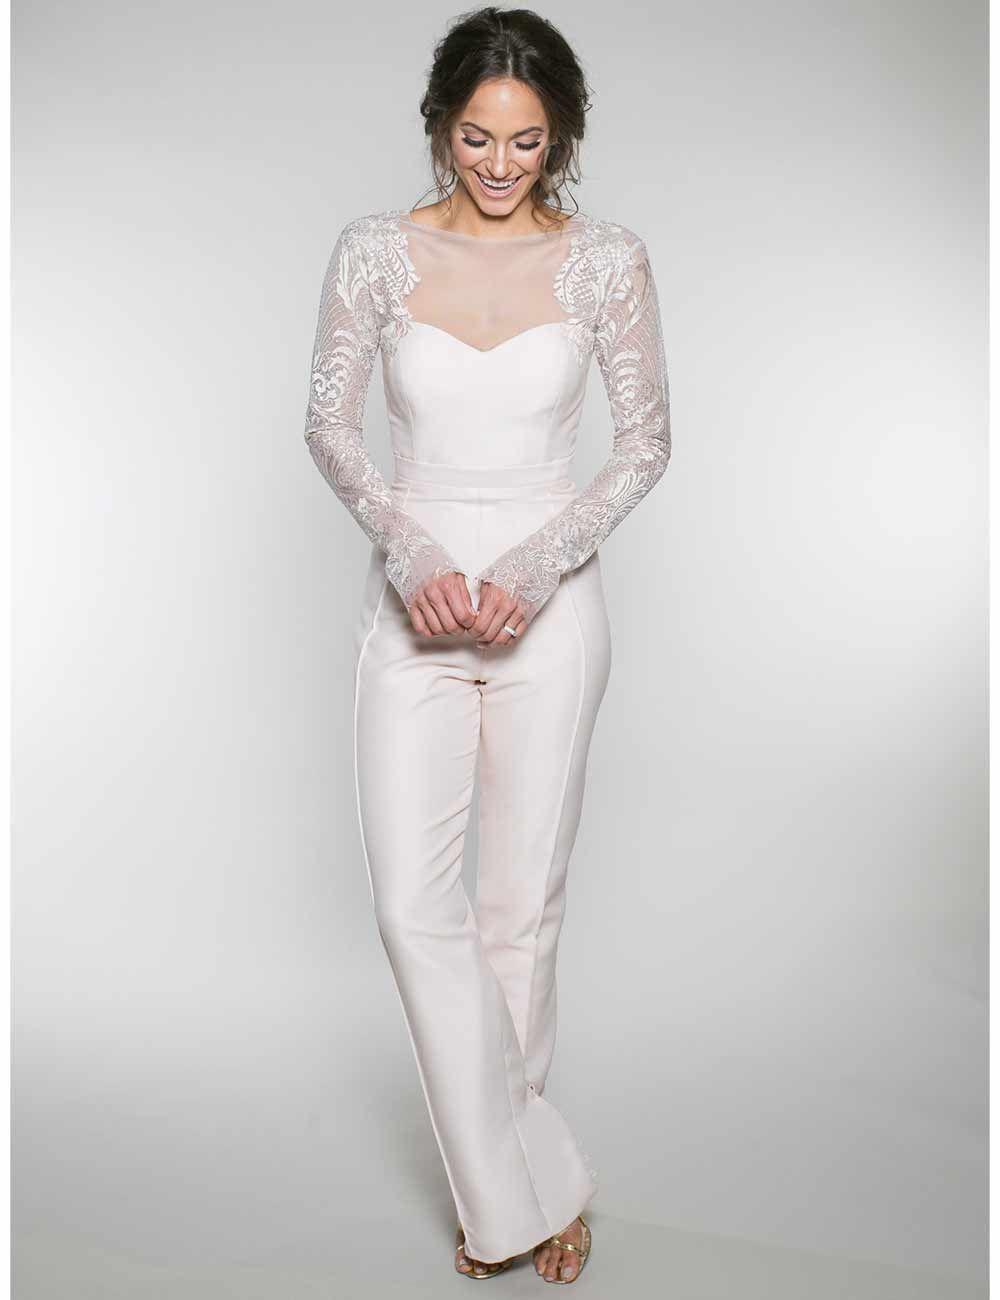 wedding jumpsuits that stylish brides will love  wedding